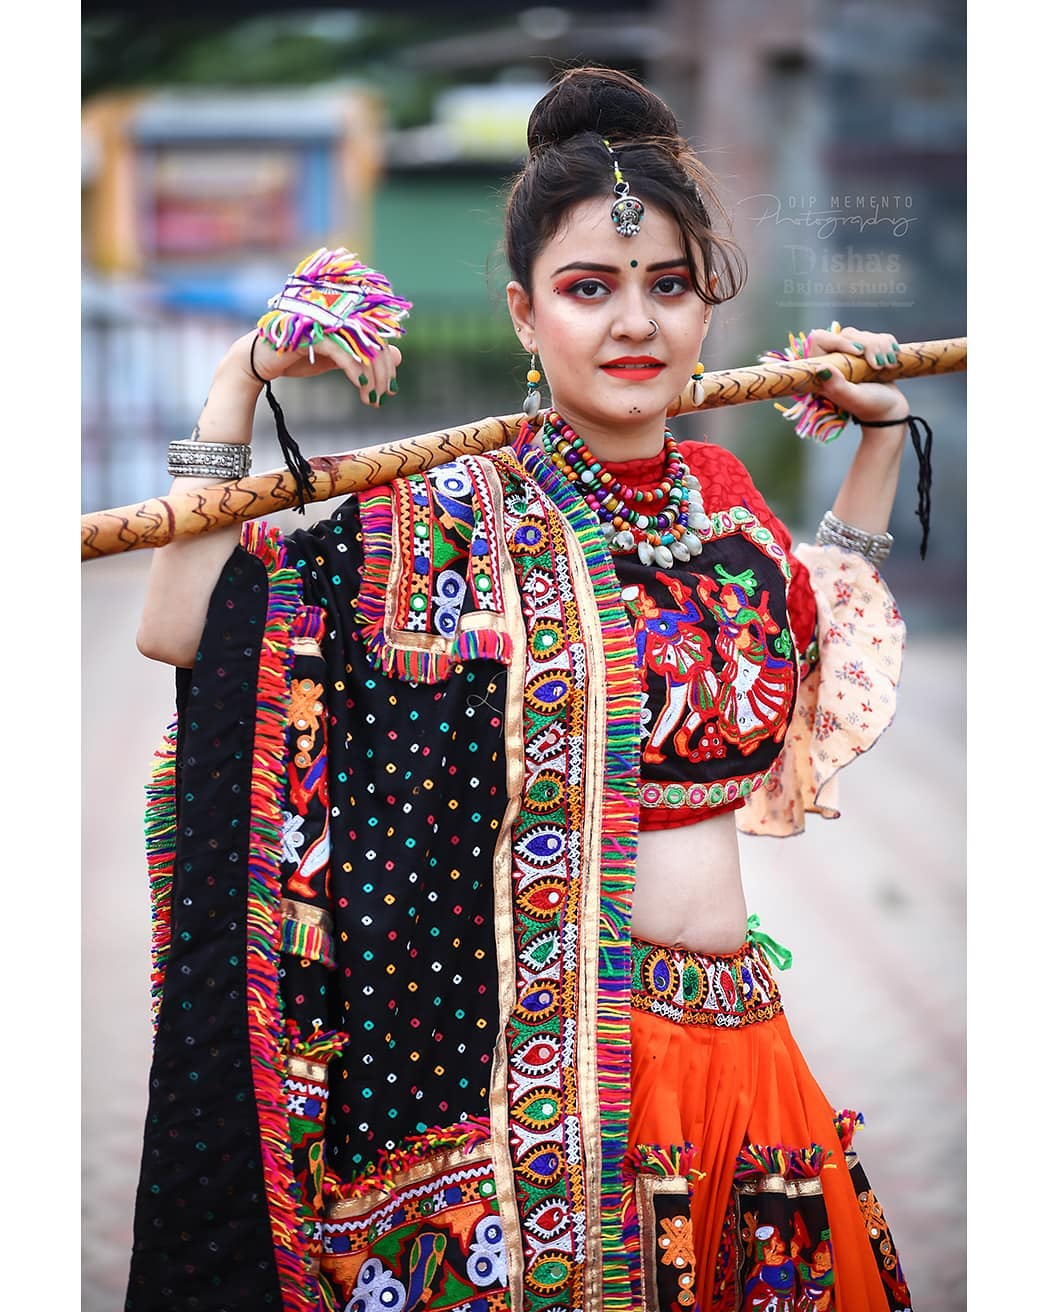 #navratri Makeup shoot . MUA: @dishabeautysaloonacademynikol @dishapanchal246  Shoot: @dip_memento_photography @meandmyphotography11 InFrame: @kajal_thakkar._0912 Jewellery: @nancyhandicraft9 Costume by: @rashmithummar . . #photoshoot #ethnic #traditionalart #ahmedabad #gujarati  #pop #makeup #navratrichaniyacholi #chaniyacholi #indianfashionblogger  #fashionblogger #makeuptutorial #weddingdress #sexy#instagram #instapic #bollywood #bollywoodhotness #bollywoodactresses #indian #pic #picoftheday #photooftheday #instagood#instamood #festivalofnations #festival